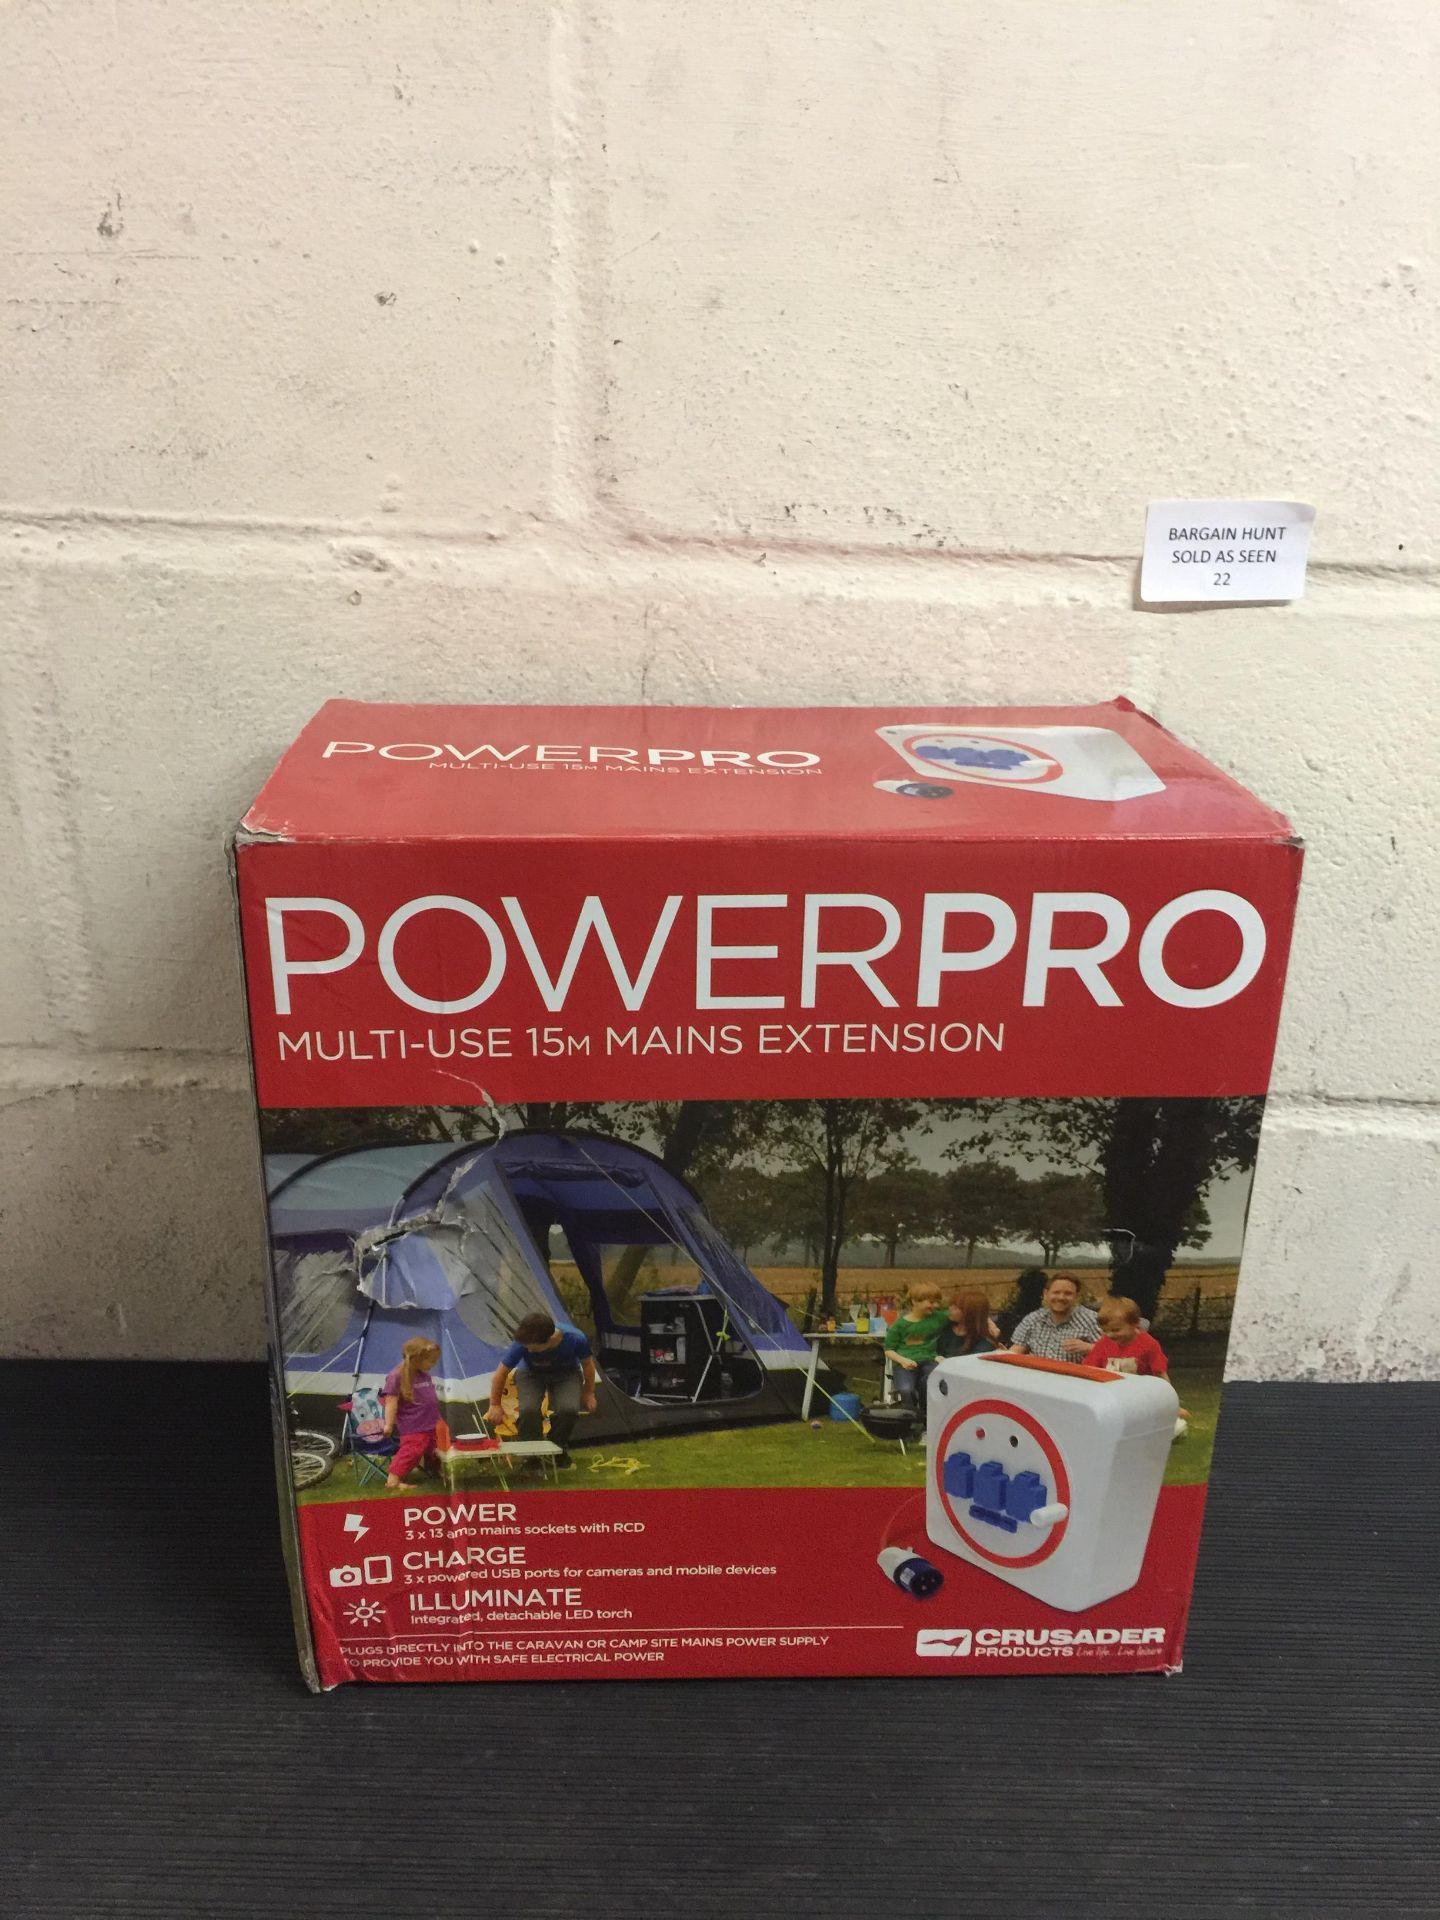 Lot 22 - Crusader PowerPro Multi-Use 15m Mains Extension